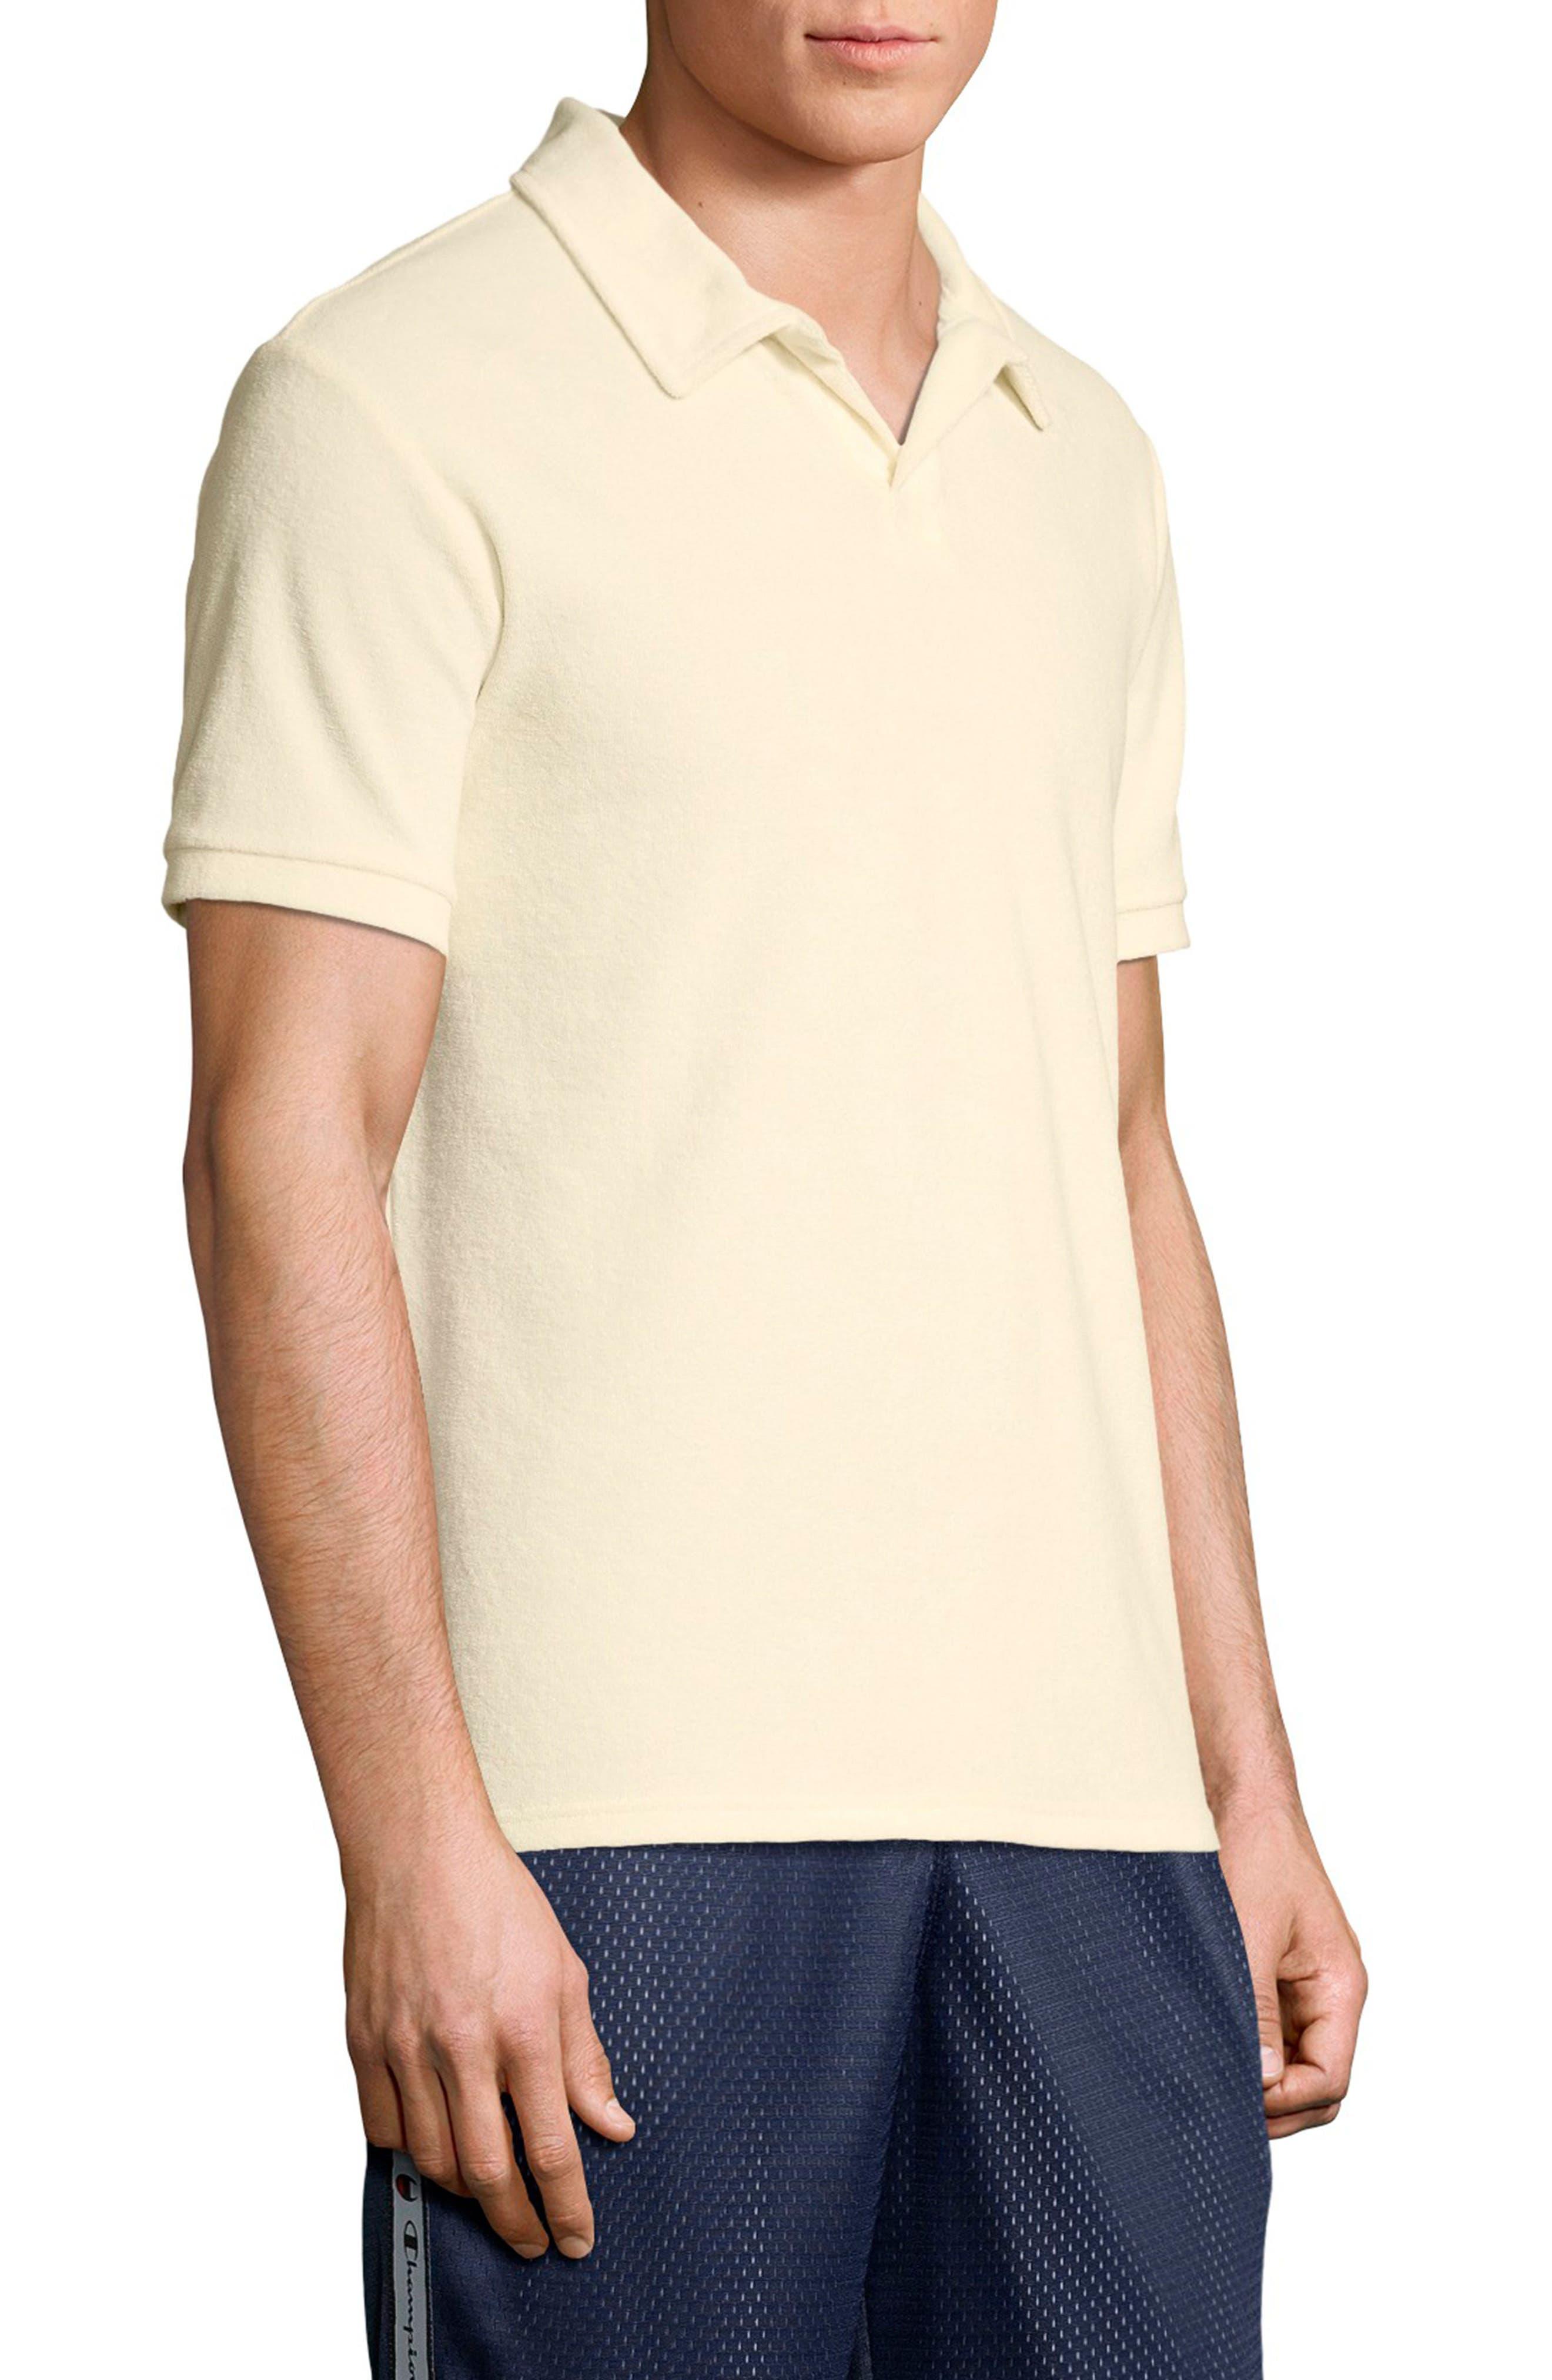 Sponge Terry Crewneck Sweatshirt,                             Alternate thumbnail 3, color,                             WHITE ALABASTER